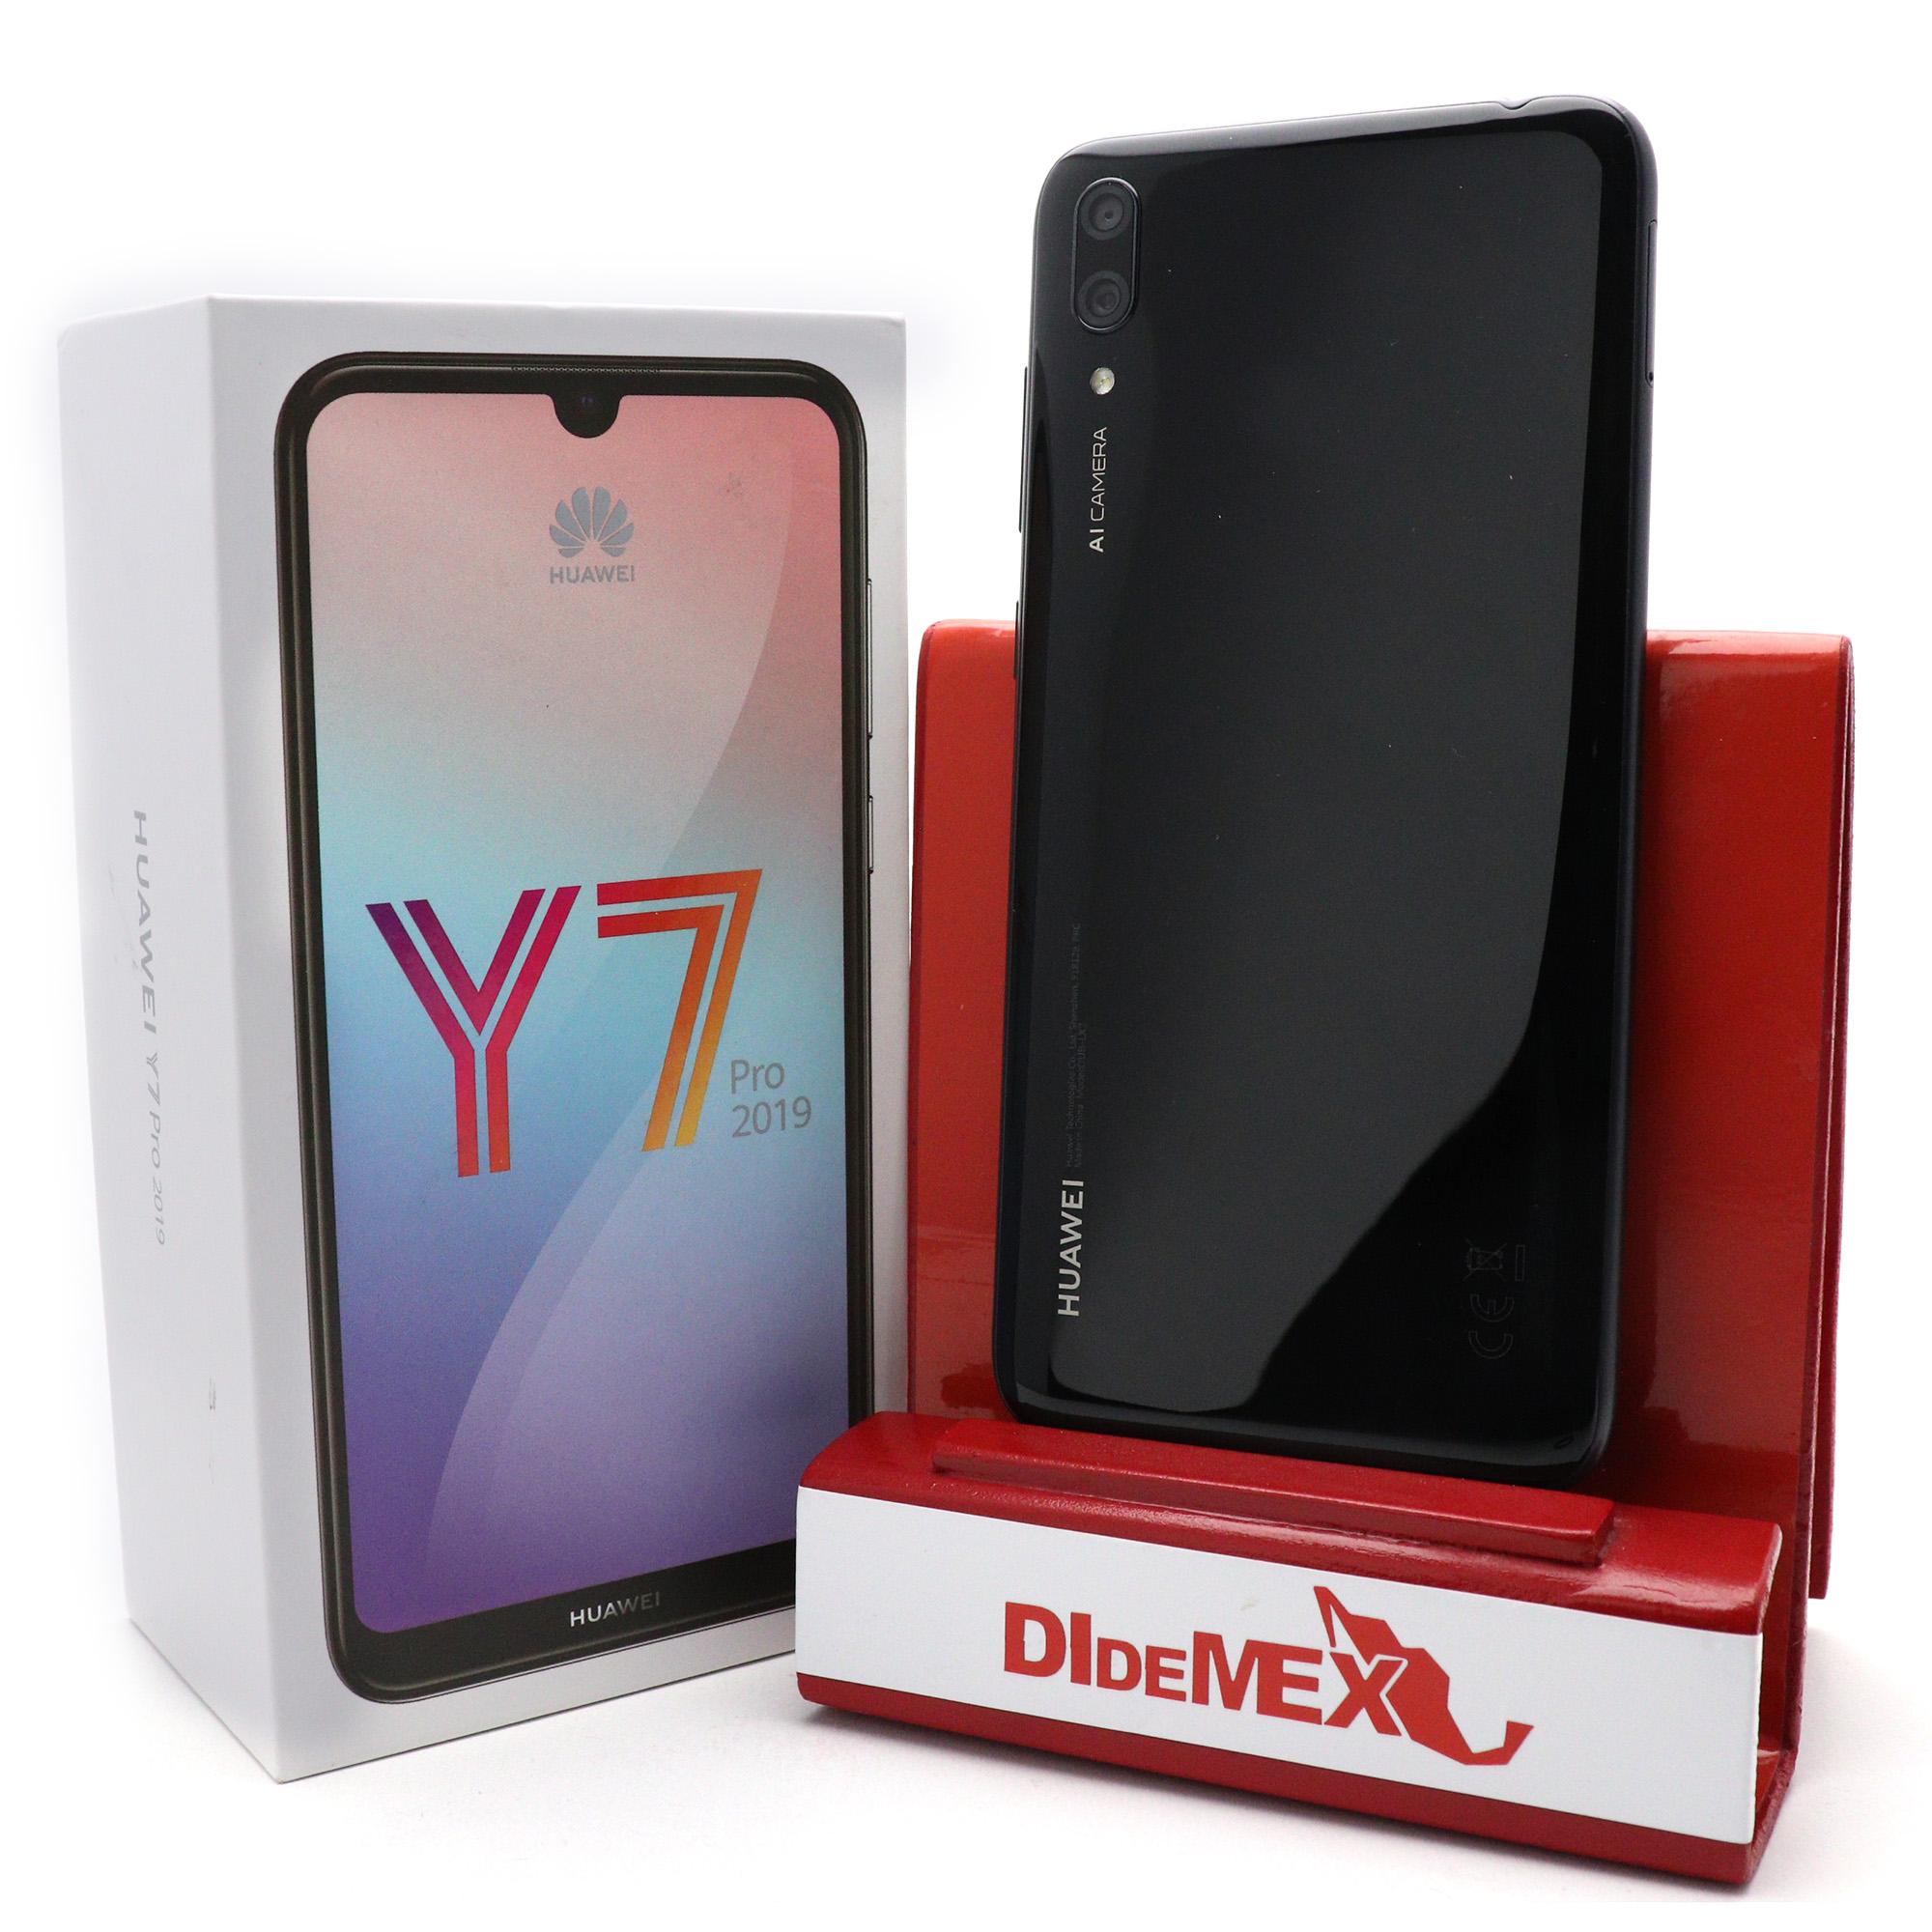 Huawei Y7 PRO 2019 32gb Negro